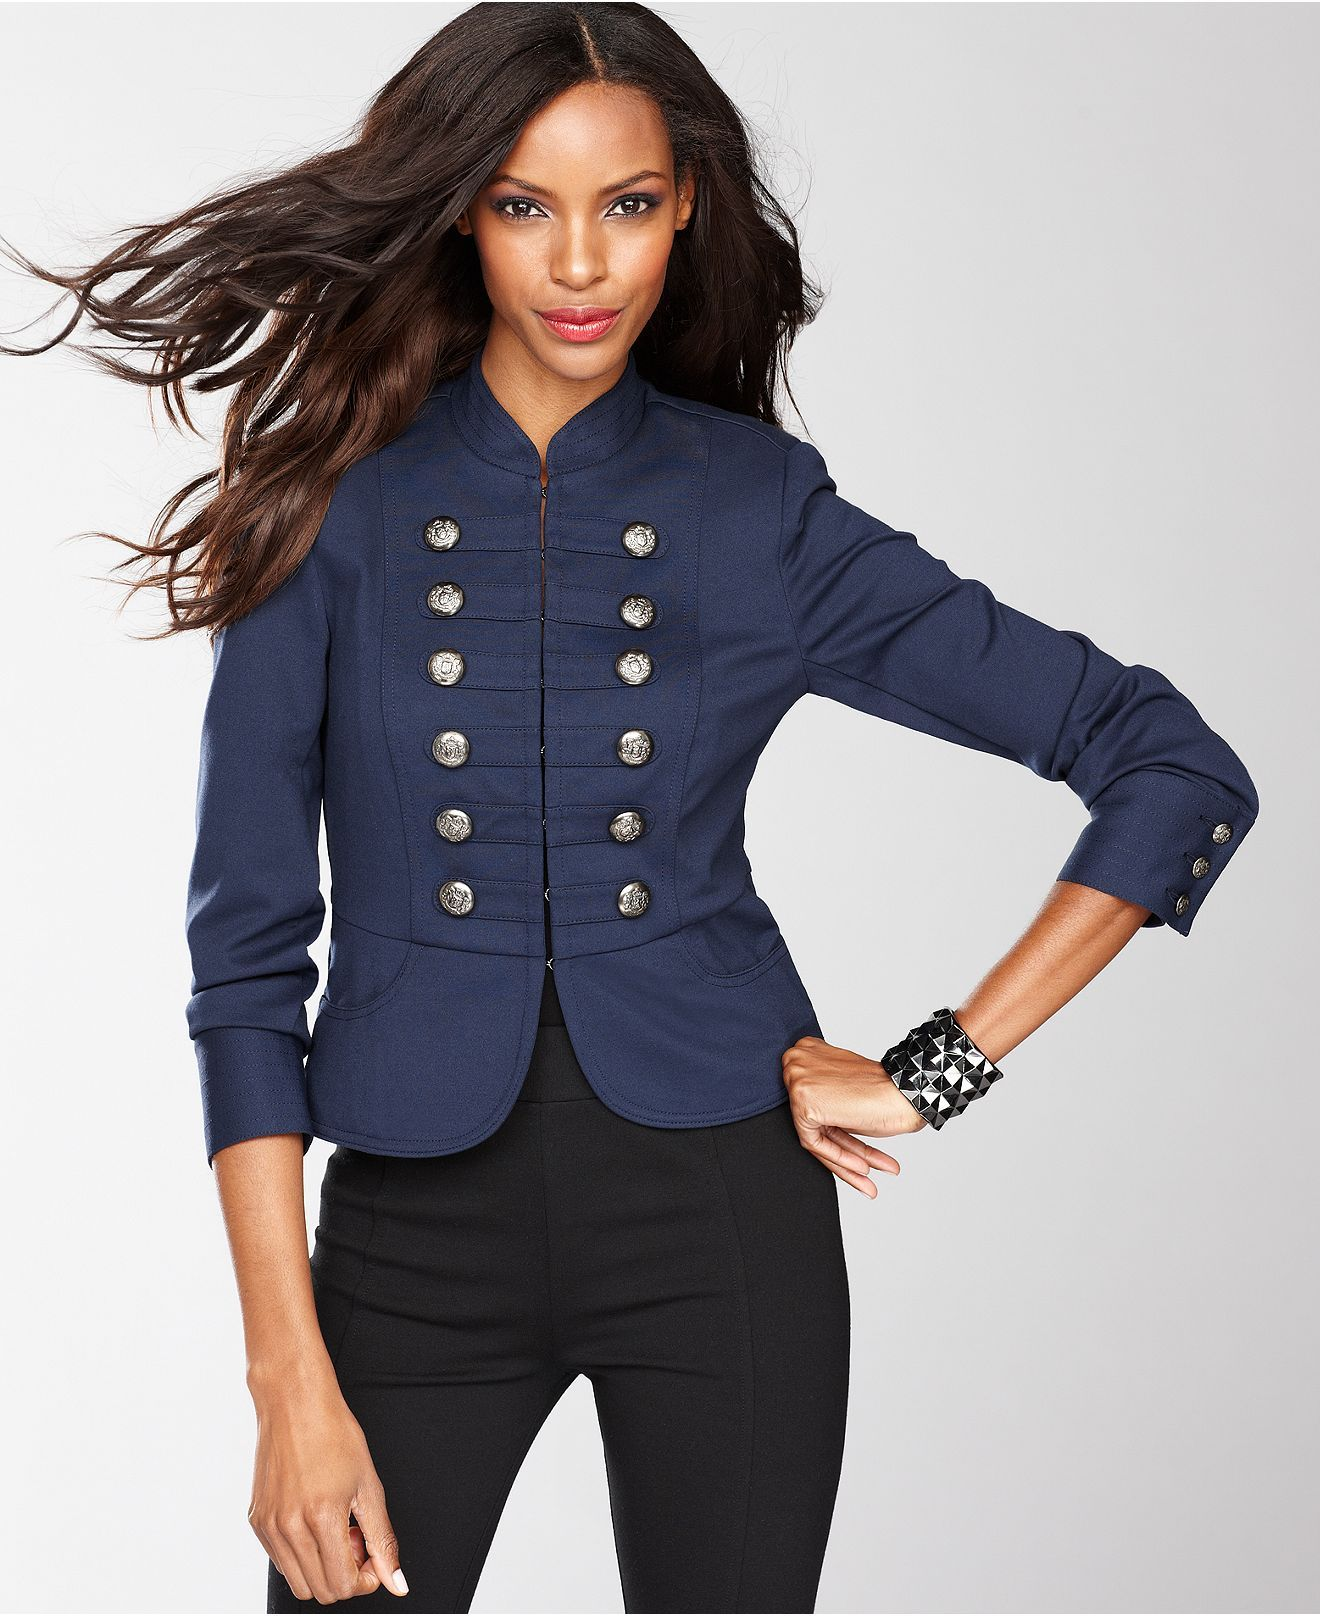 Inc International Concepts Petite Jacket Miltary Embellished Blazer Womens Petite Jackets Petite Jacket Fashion For Petite Women Blazer Jackets For Women